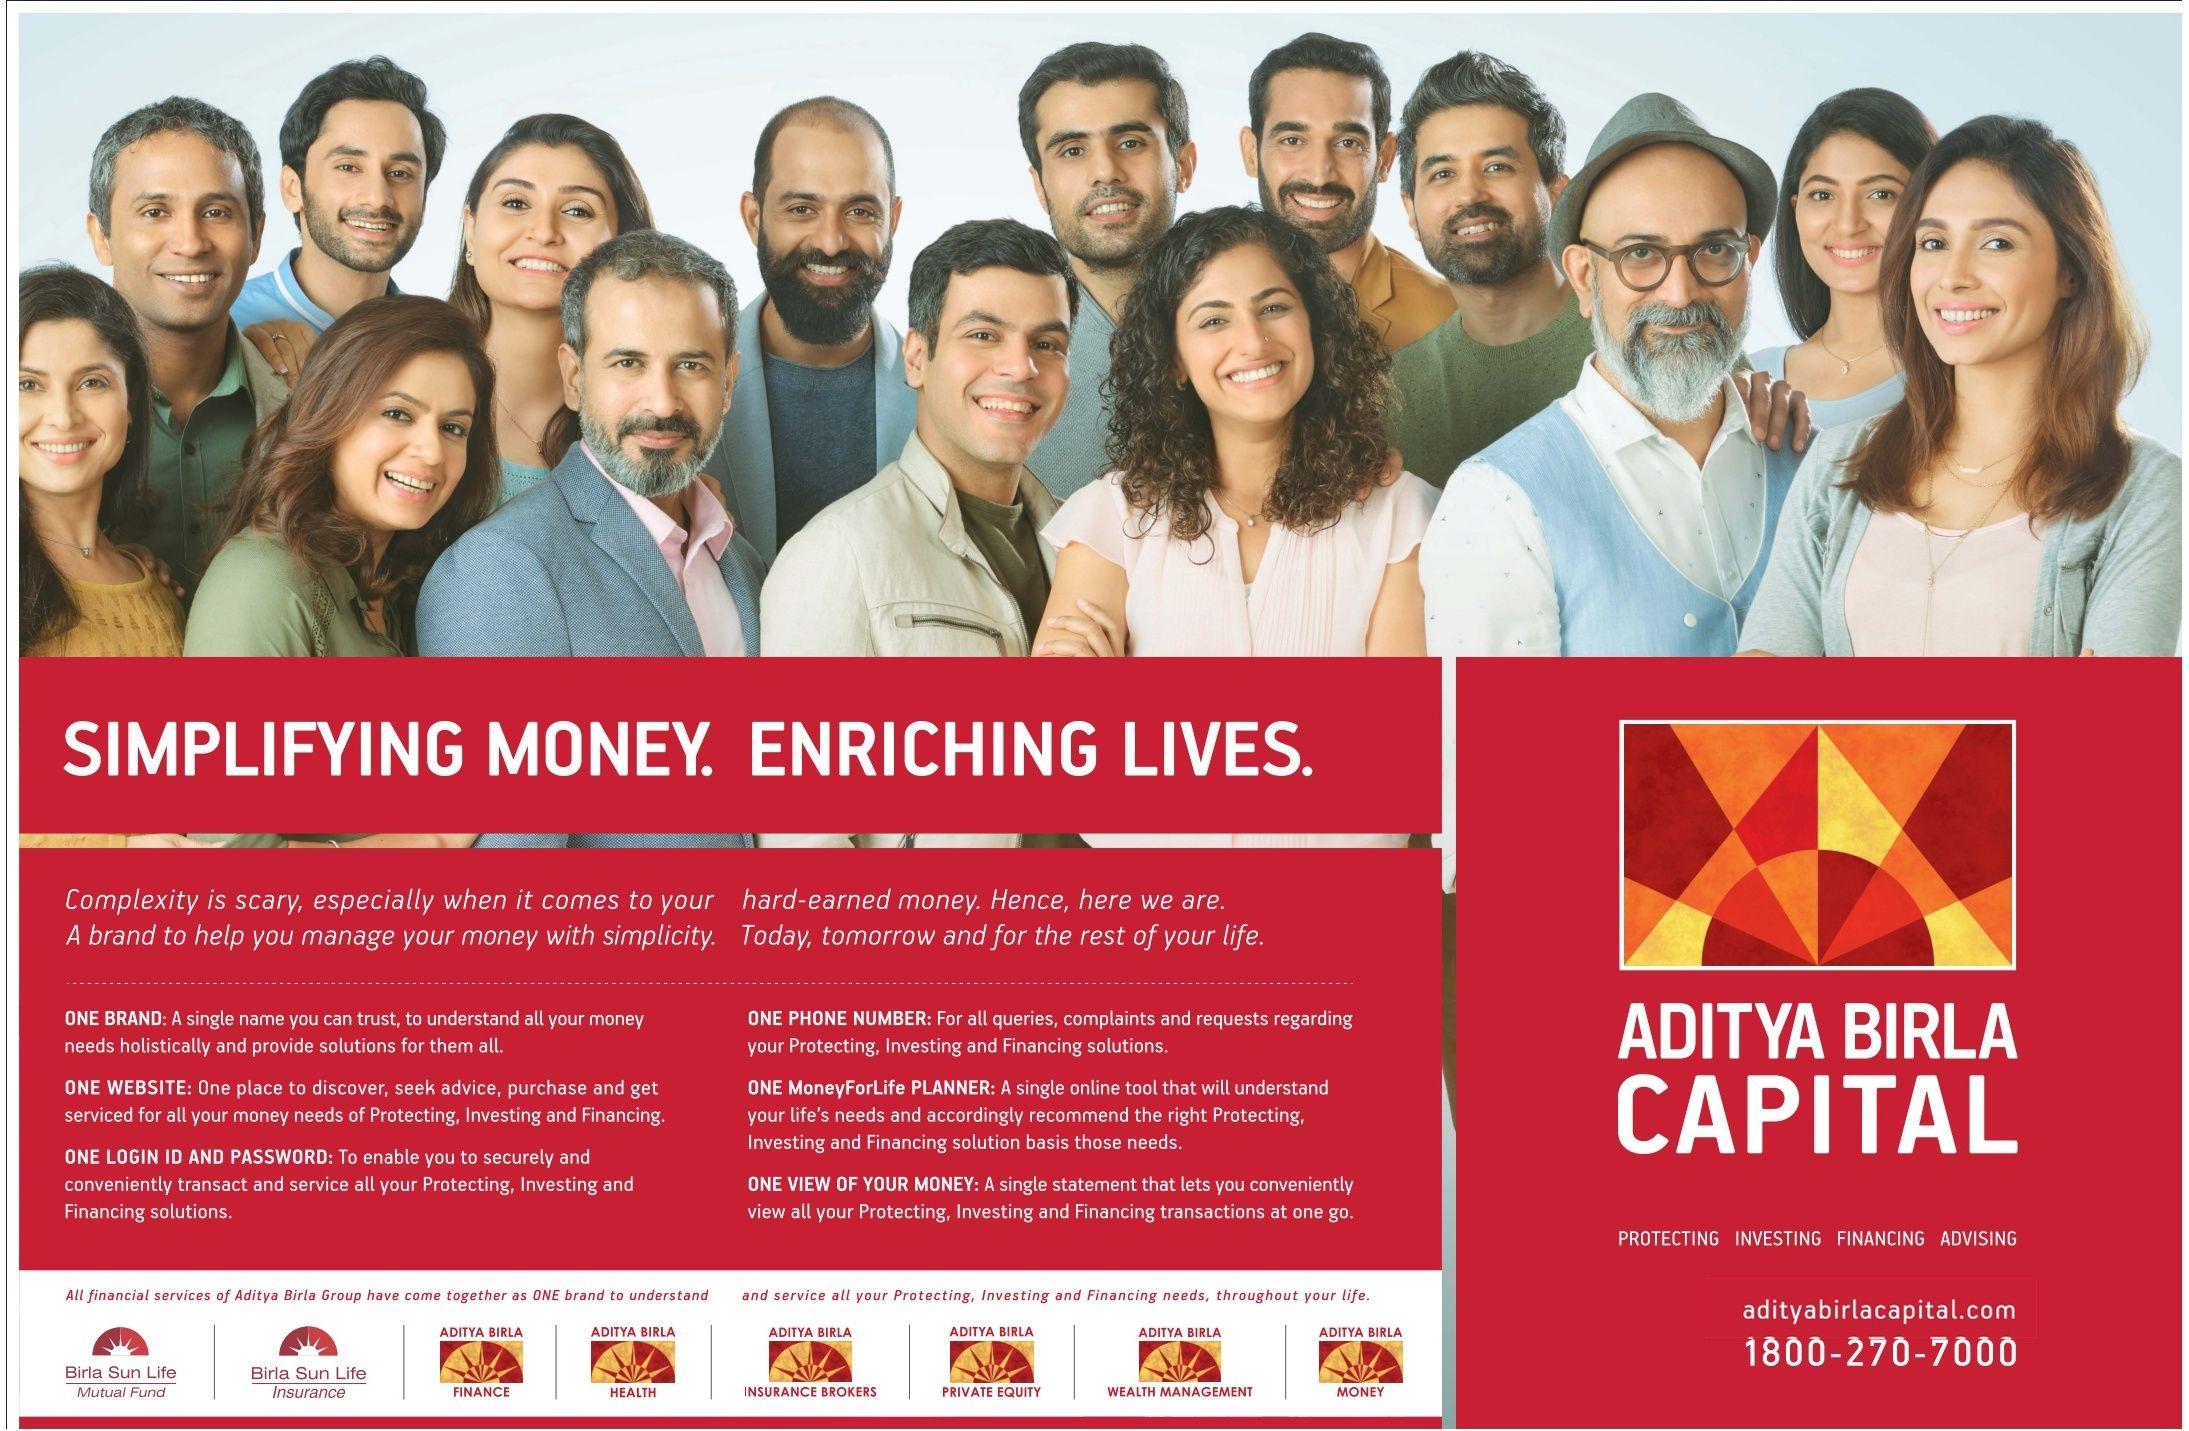 Aditya Birla Capital Simplifying Money Enriching Lives Ad Times Of